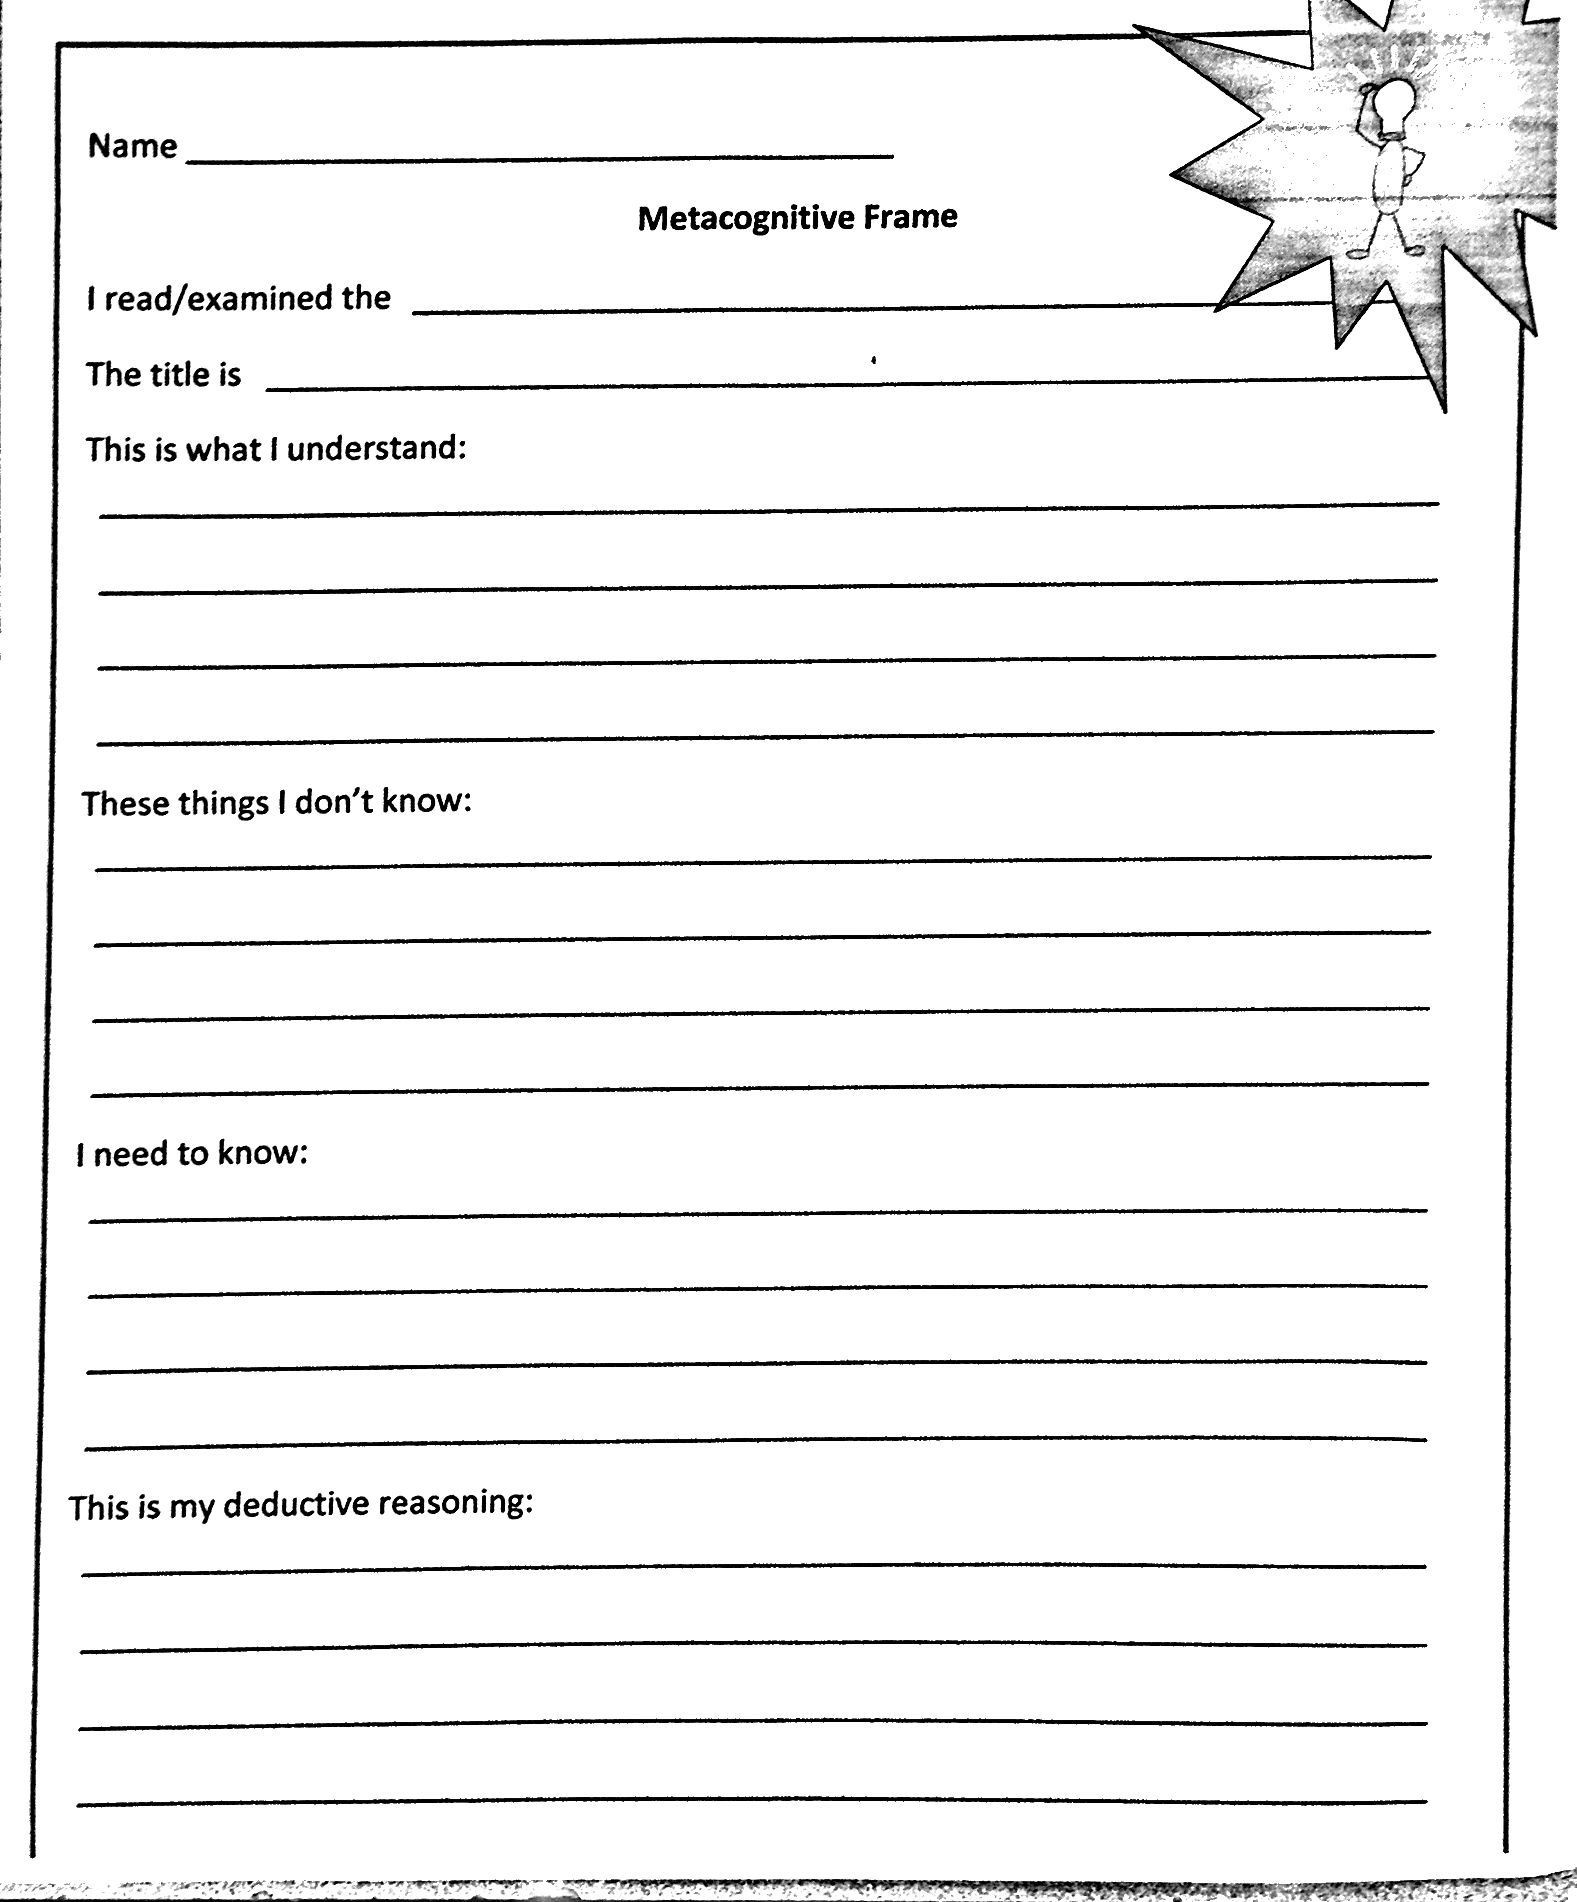 Social Studies Worksheets 6th Grade Best social Stu S for 7th Graders Worksheet